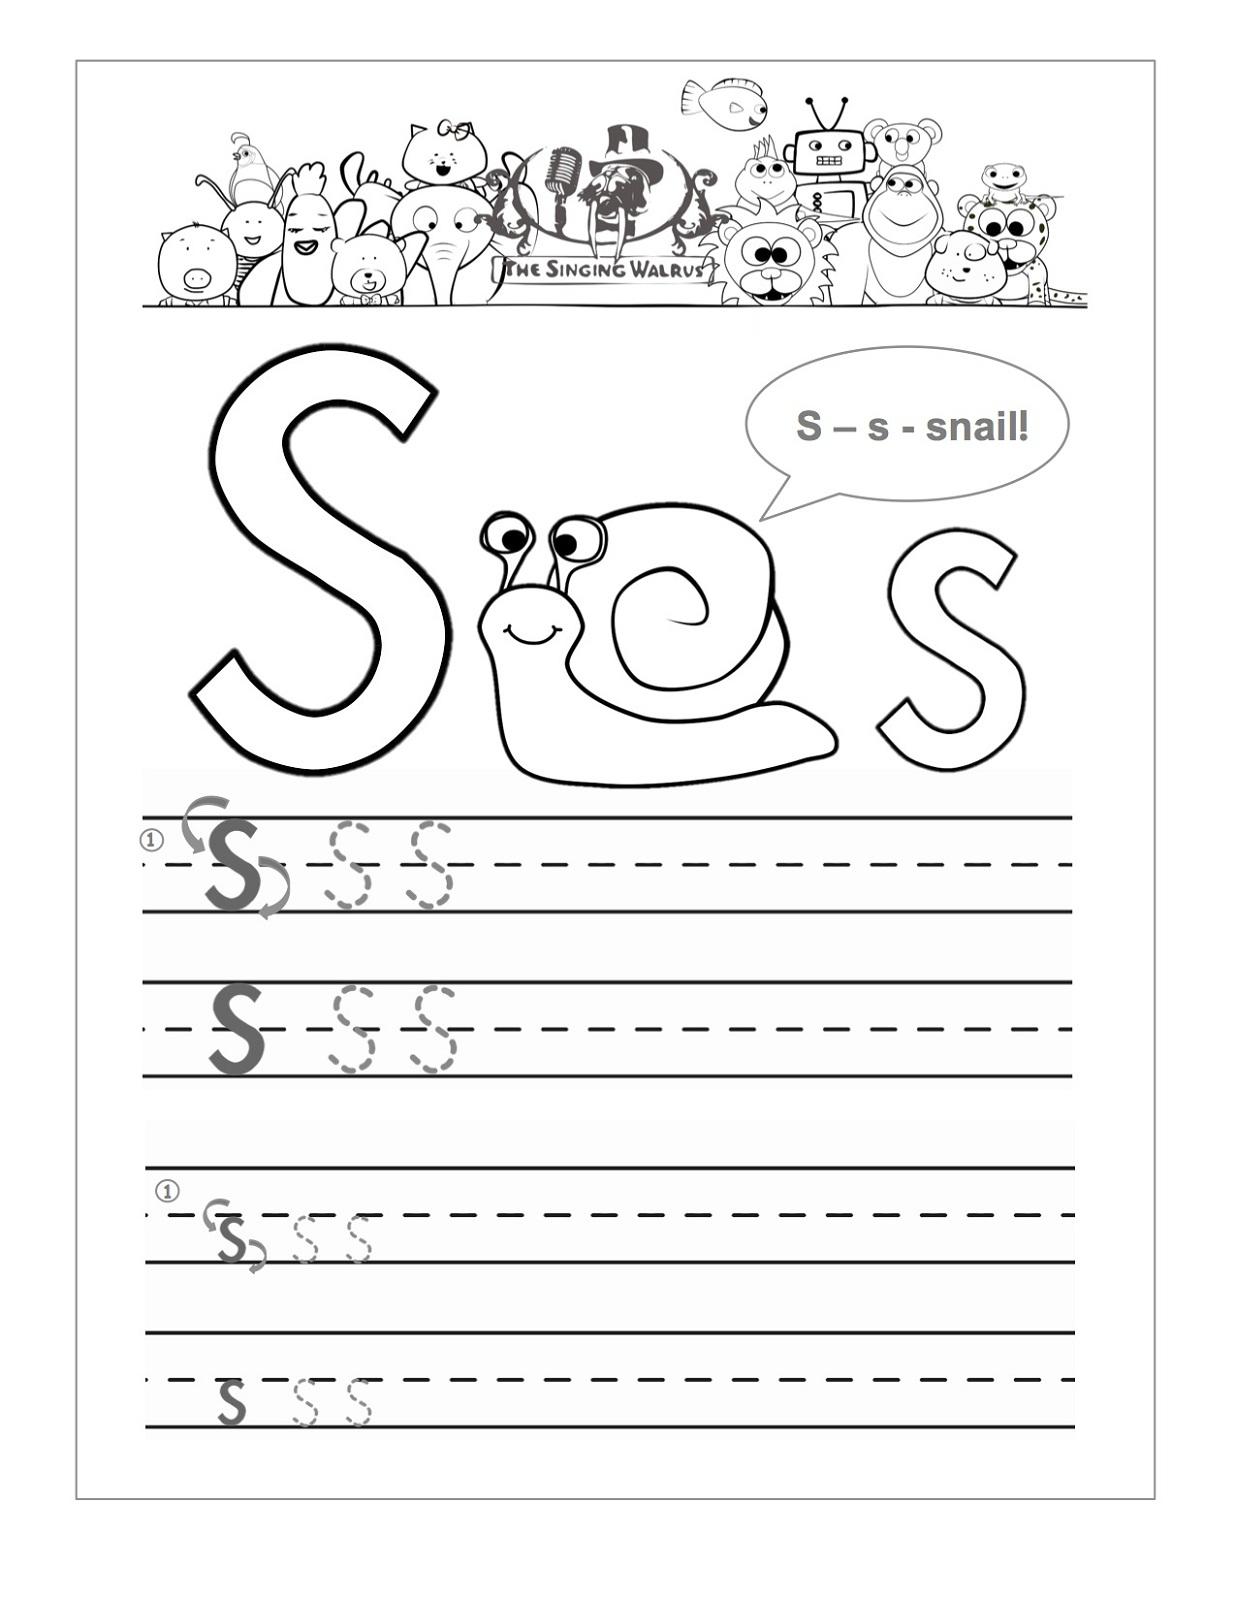 Letter S W Ksheets Preschoolers Free W Ksheets Libr Ry